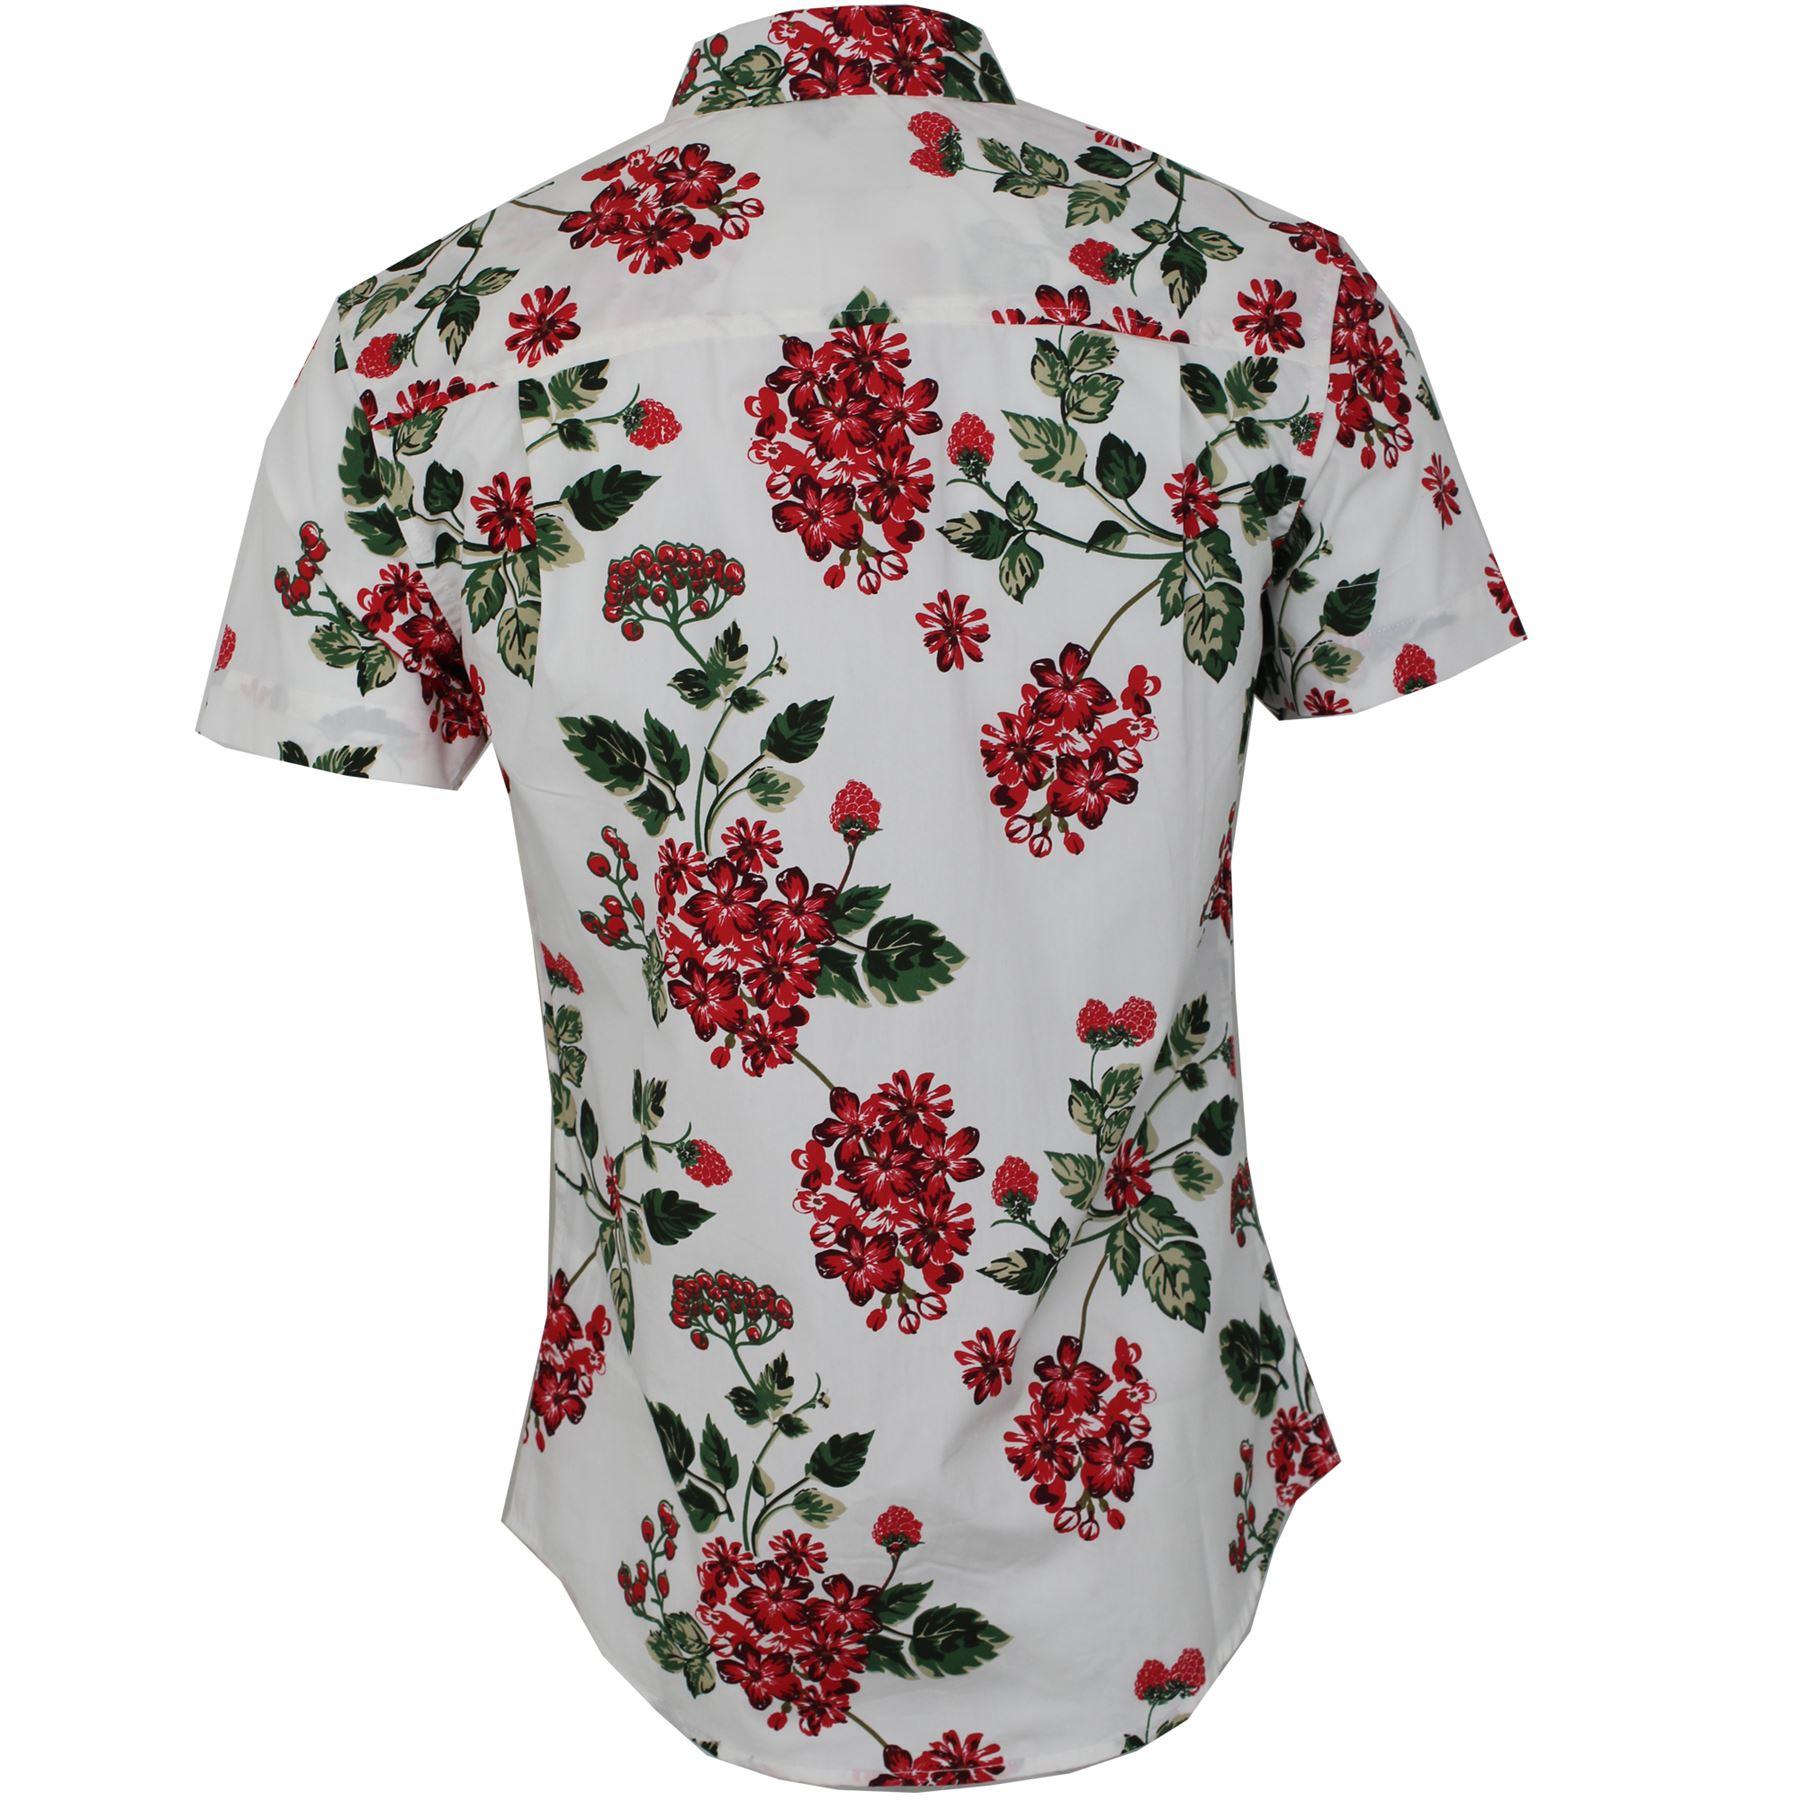 Mens threadbare floral hawaiian casual summer short sleeve for Mens short sleeve floral shirt